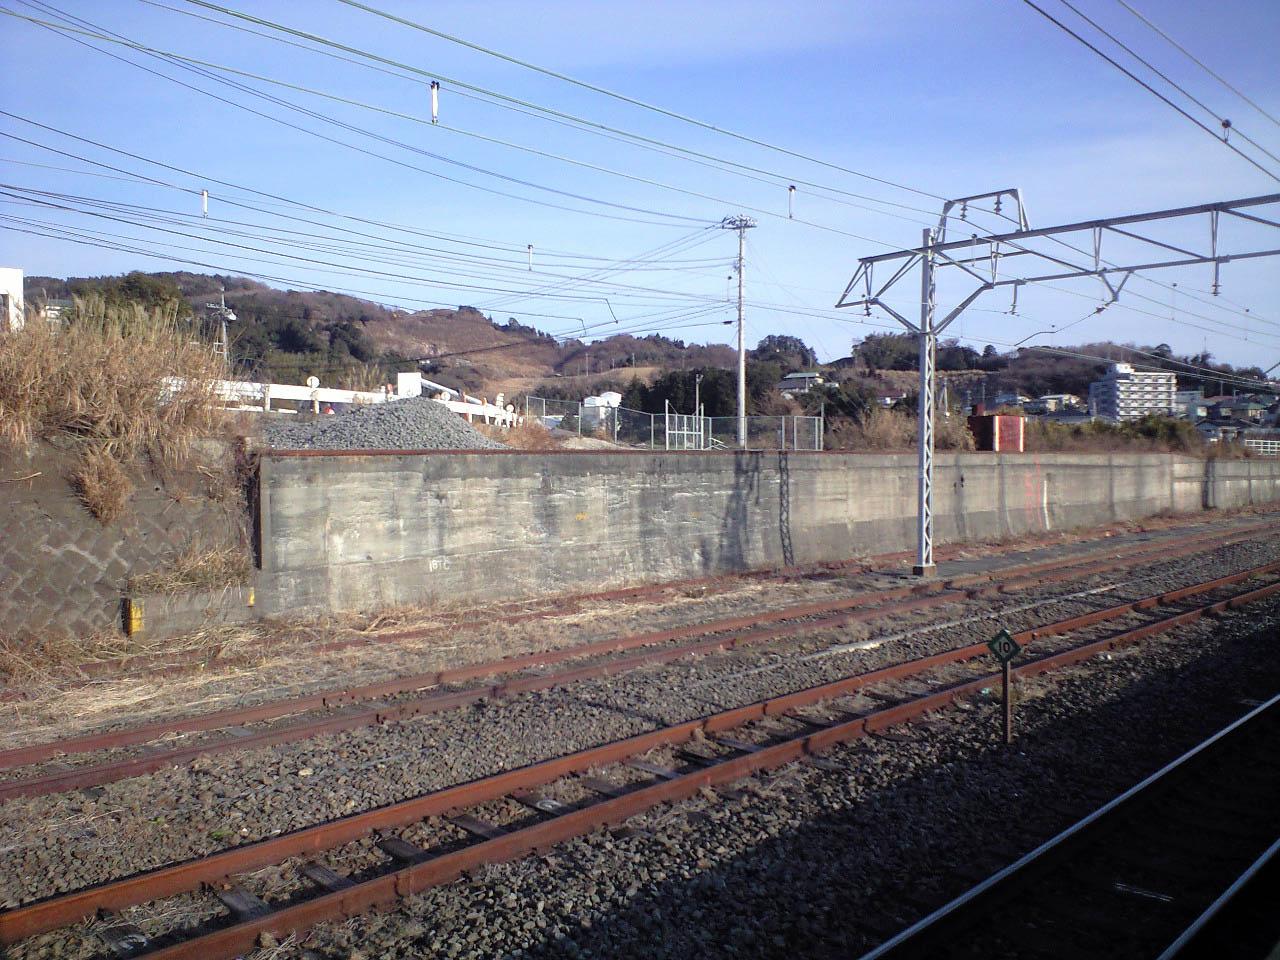 https://upload.wikimedia.org/wikipedia/commons/1/1c/JR-manazuru-station-3.jpg